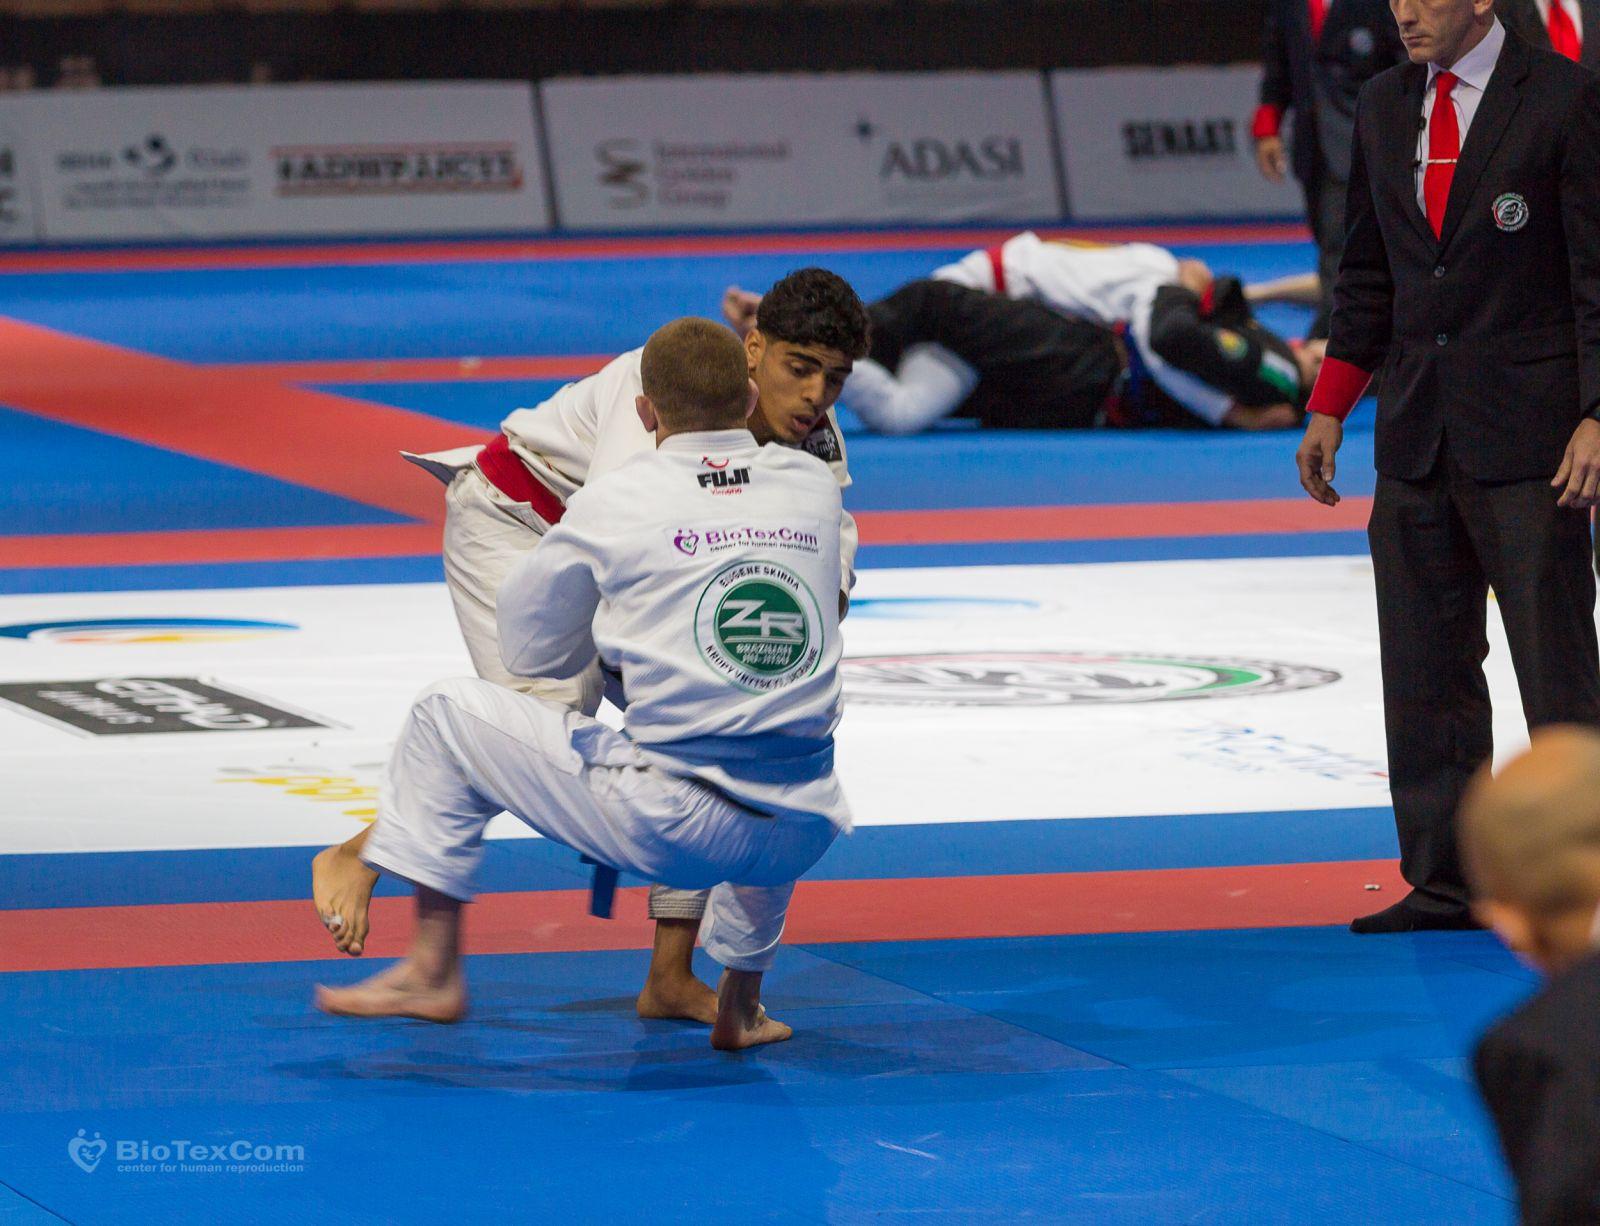 blazhko-yaroslav_Abu-Dhabi-World-Championship-2017-1_06